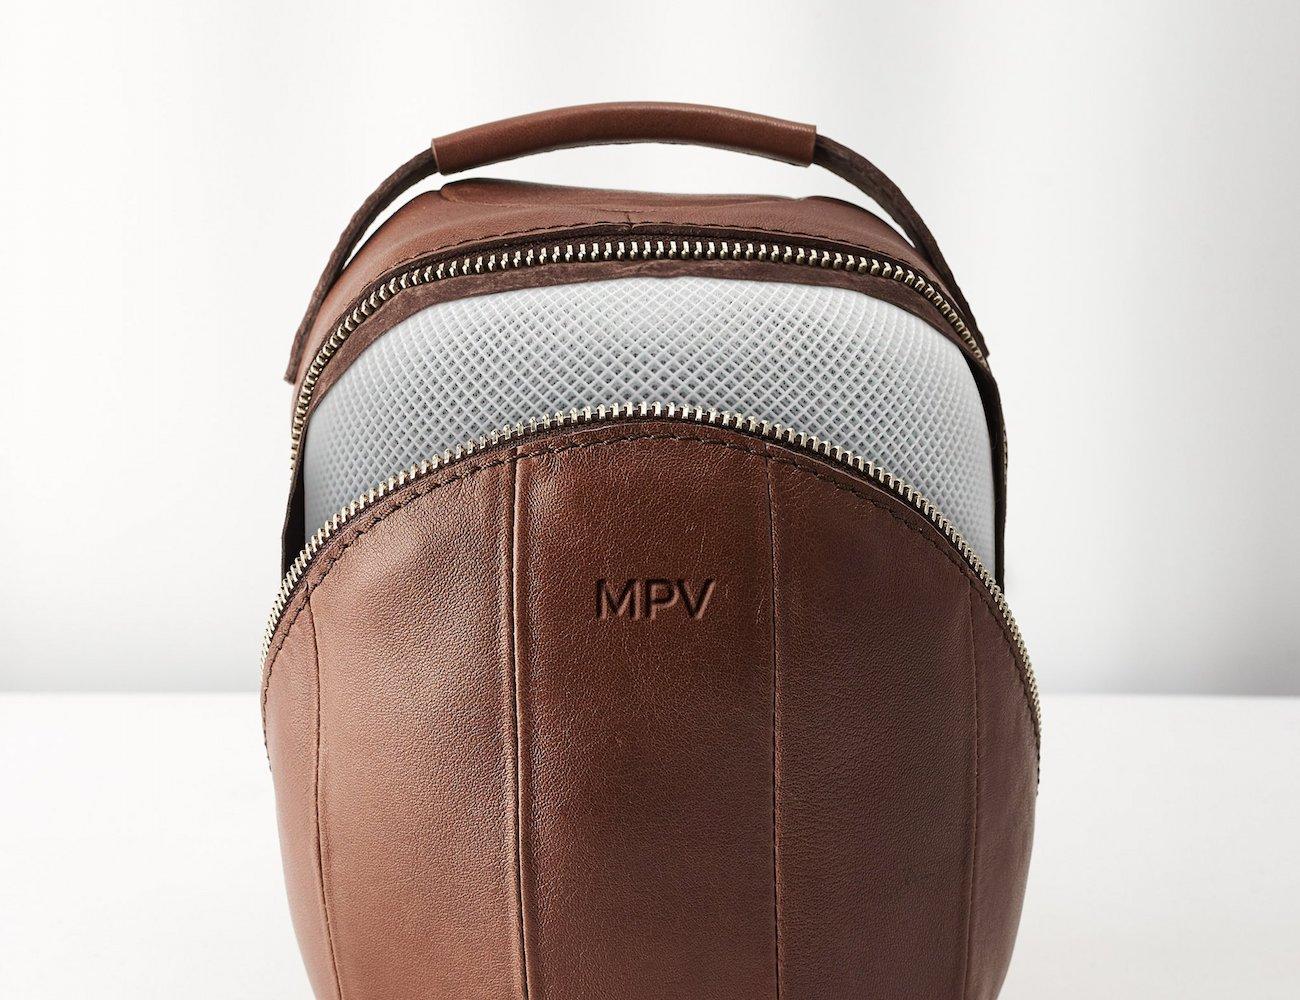 Capra Leather HomePod Travel Case